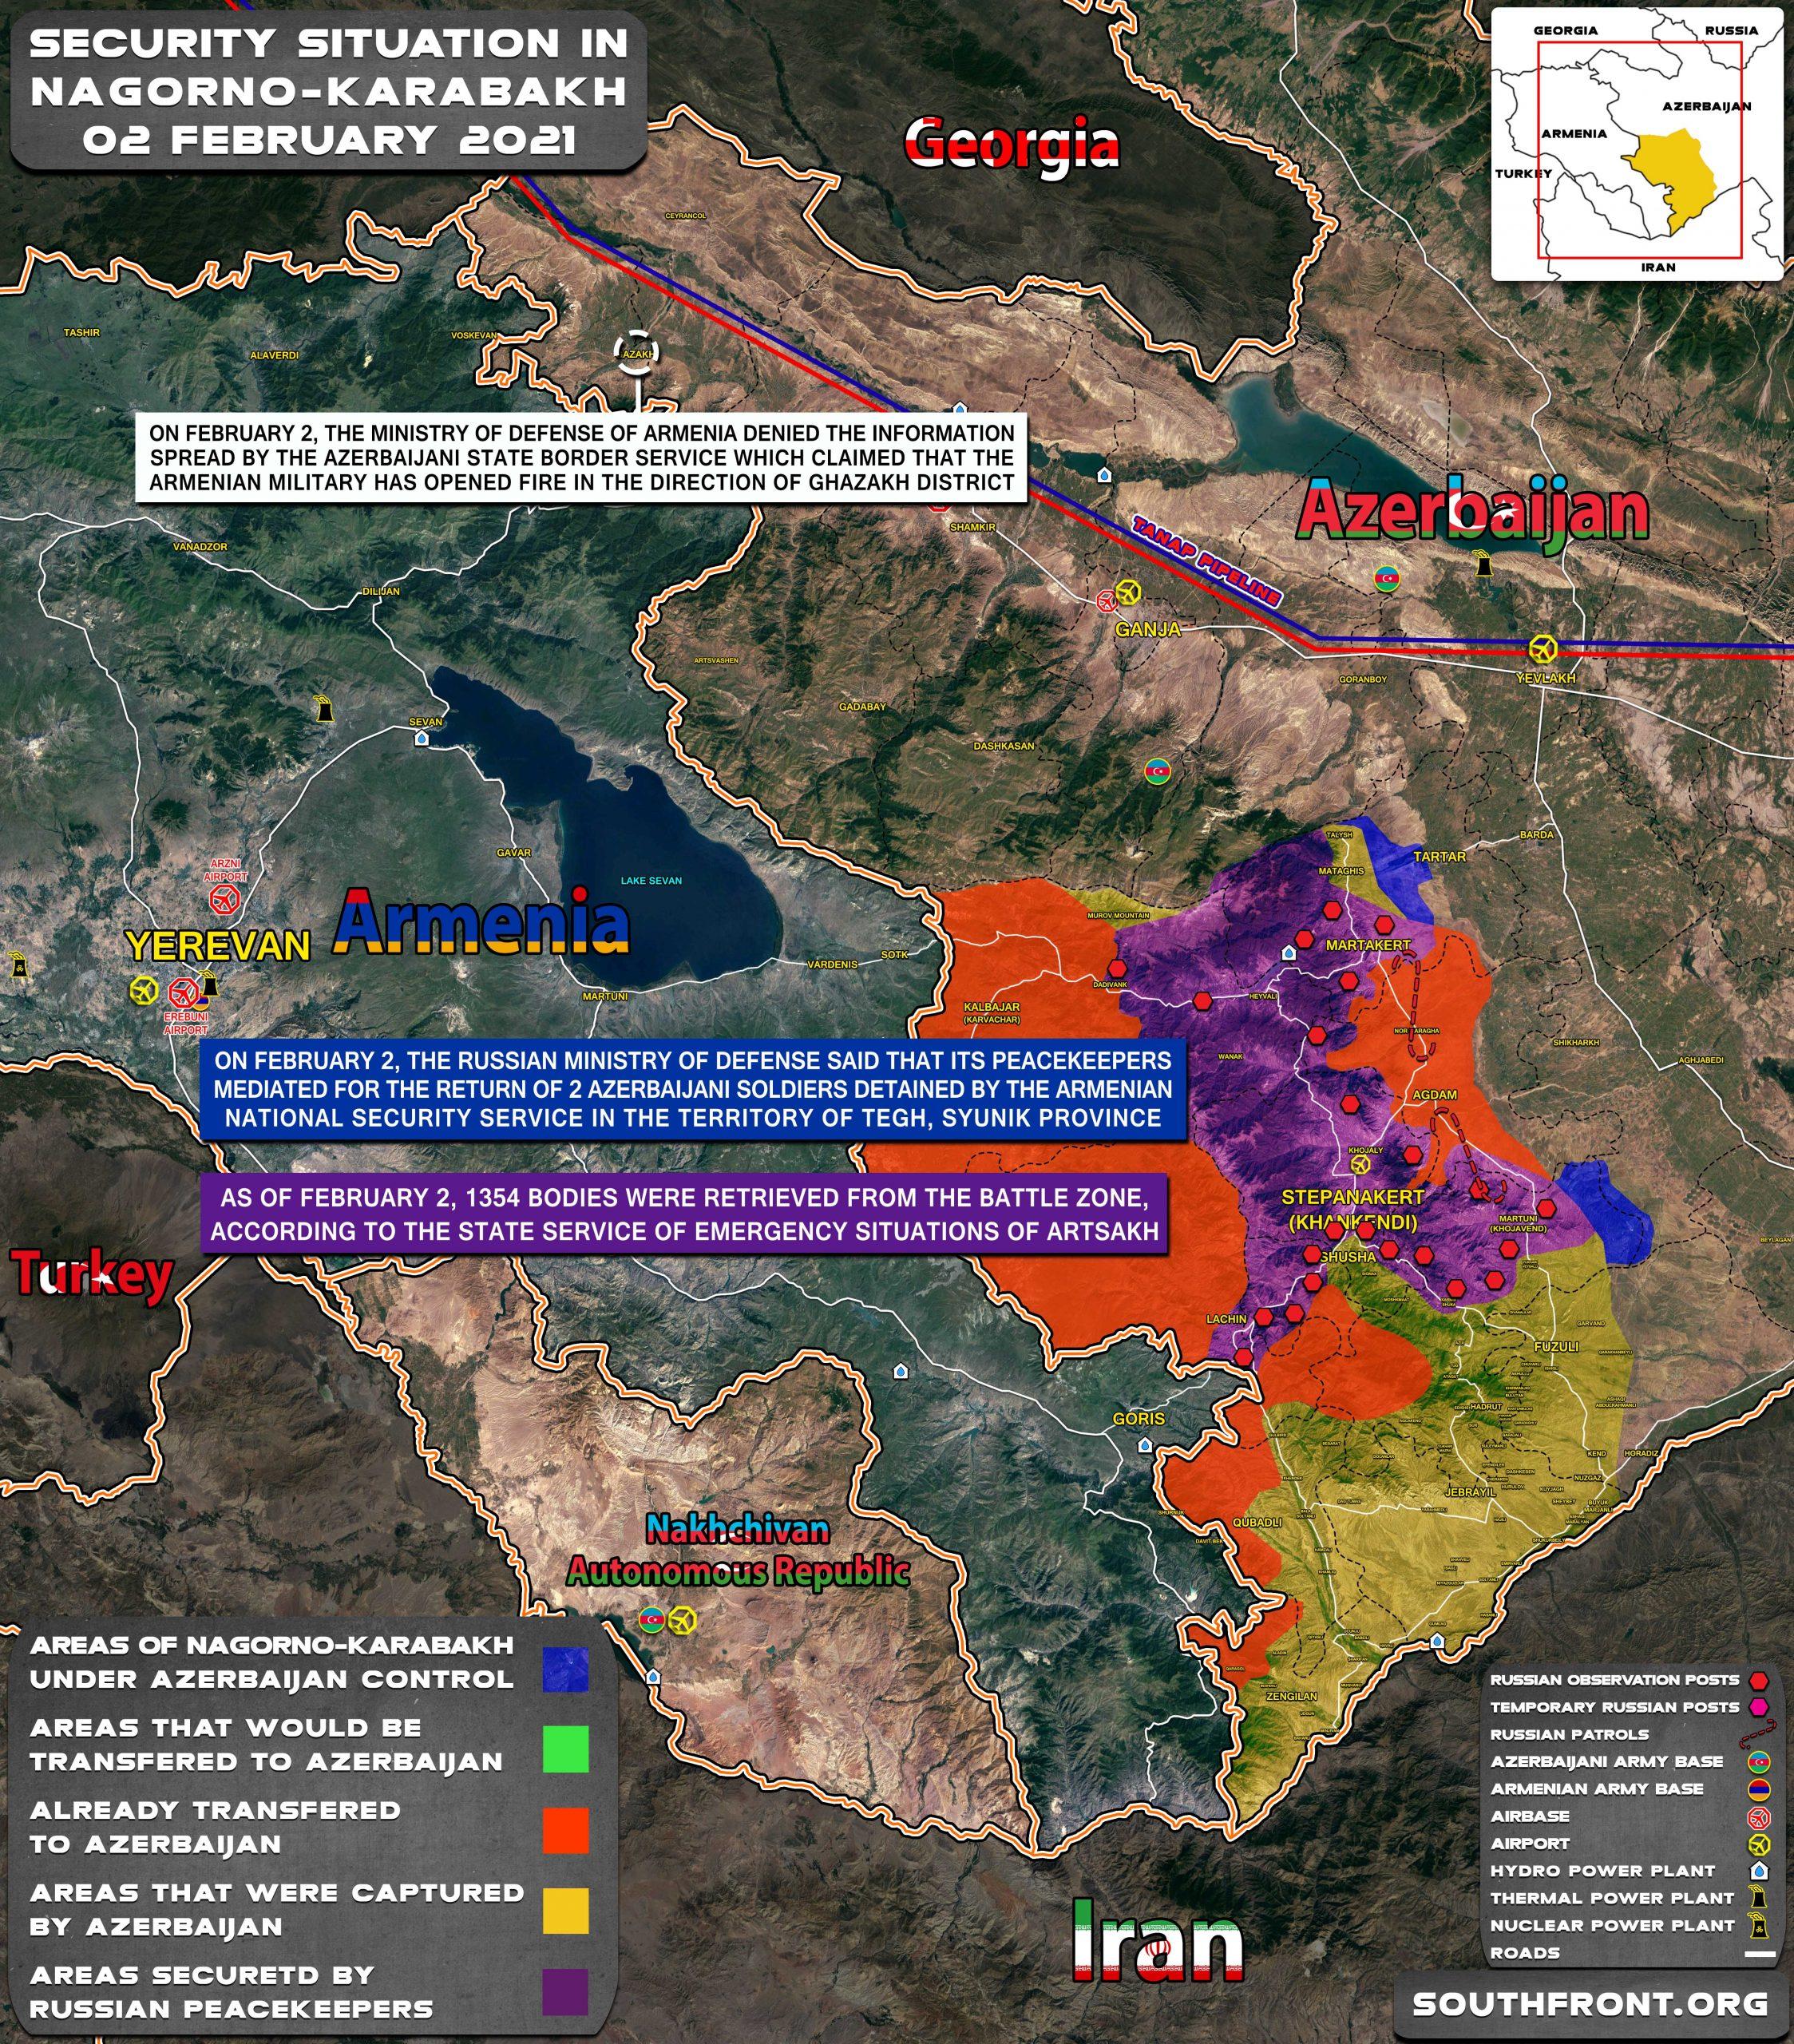 Russian Peacekeepers Return Azerbaijanis Detained In Syunik Province, Azer-Turkish Winter Exercise 2021 Begins